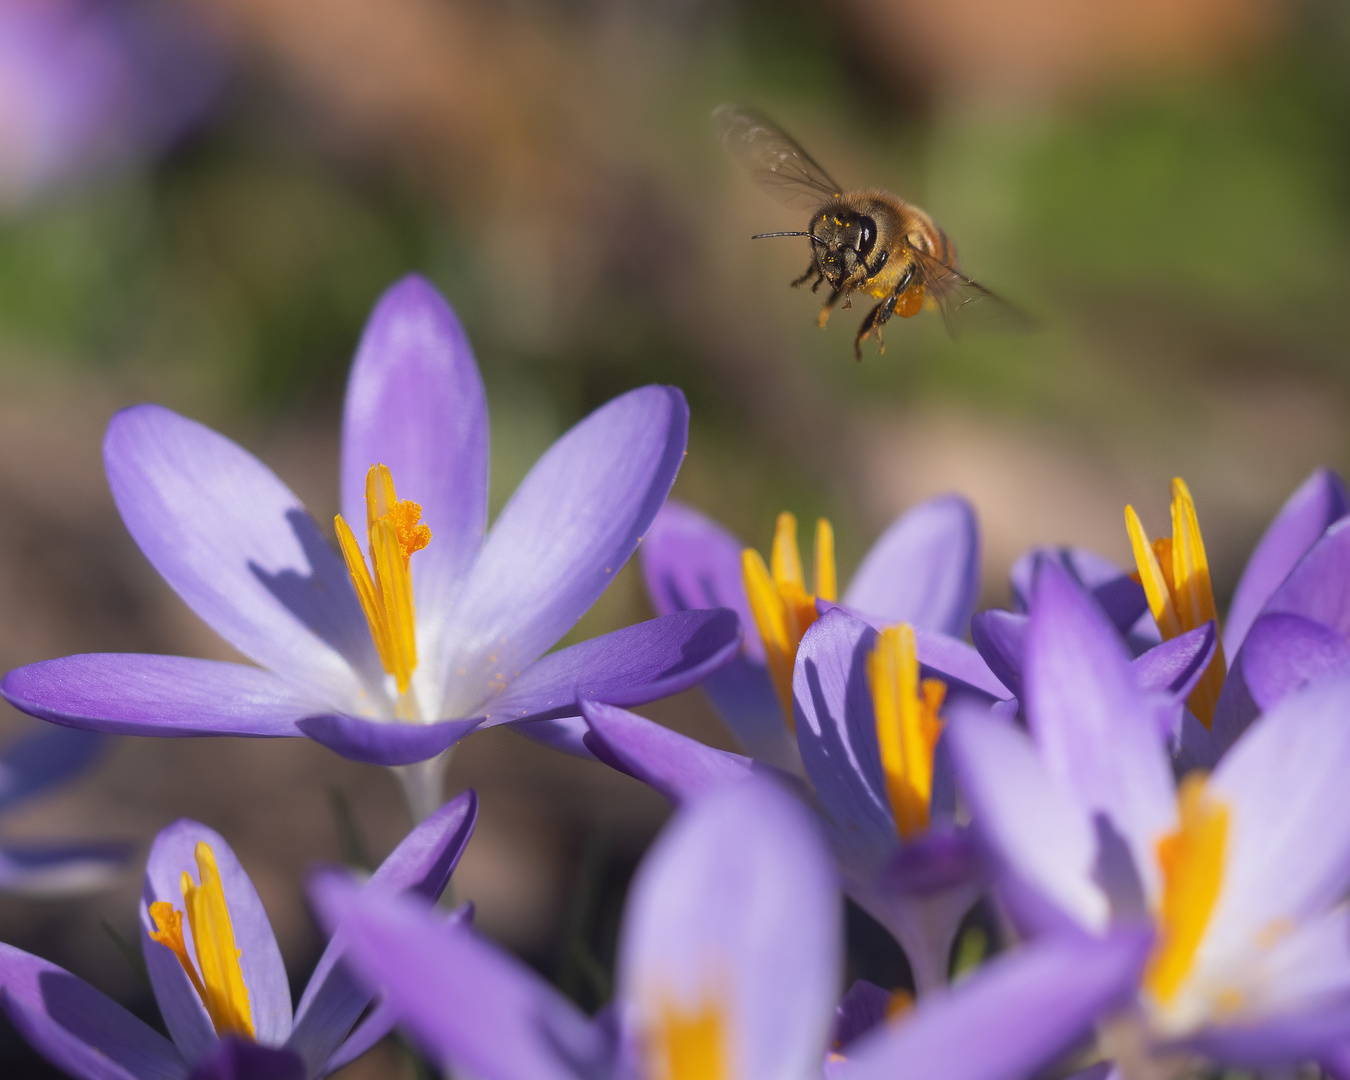 Die ersten Bienen